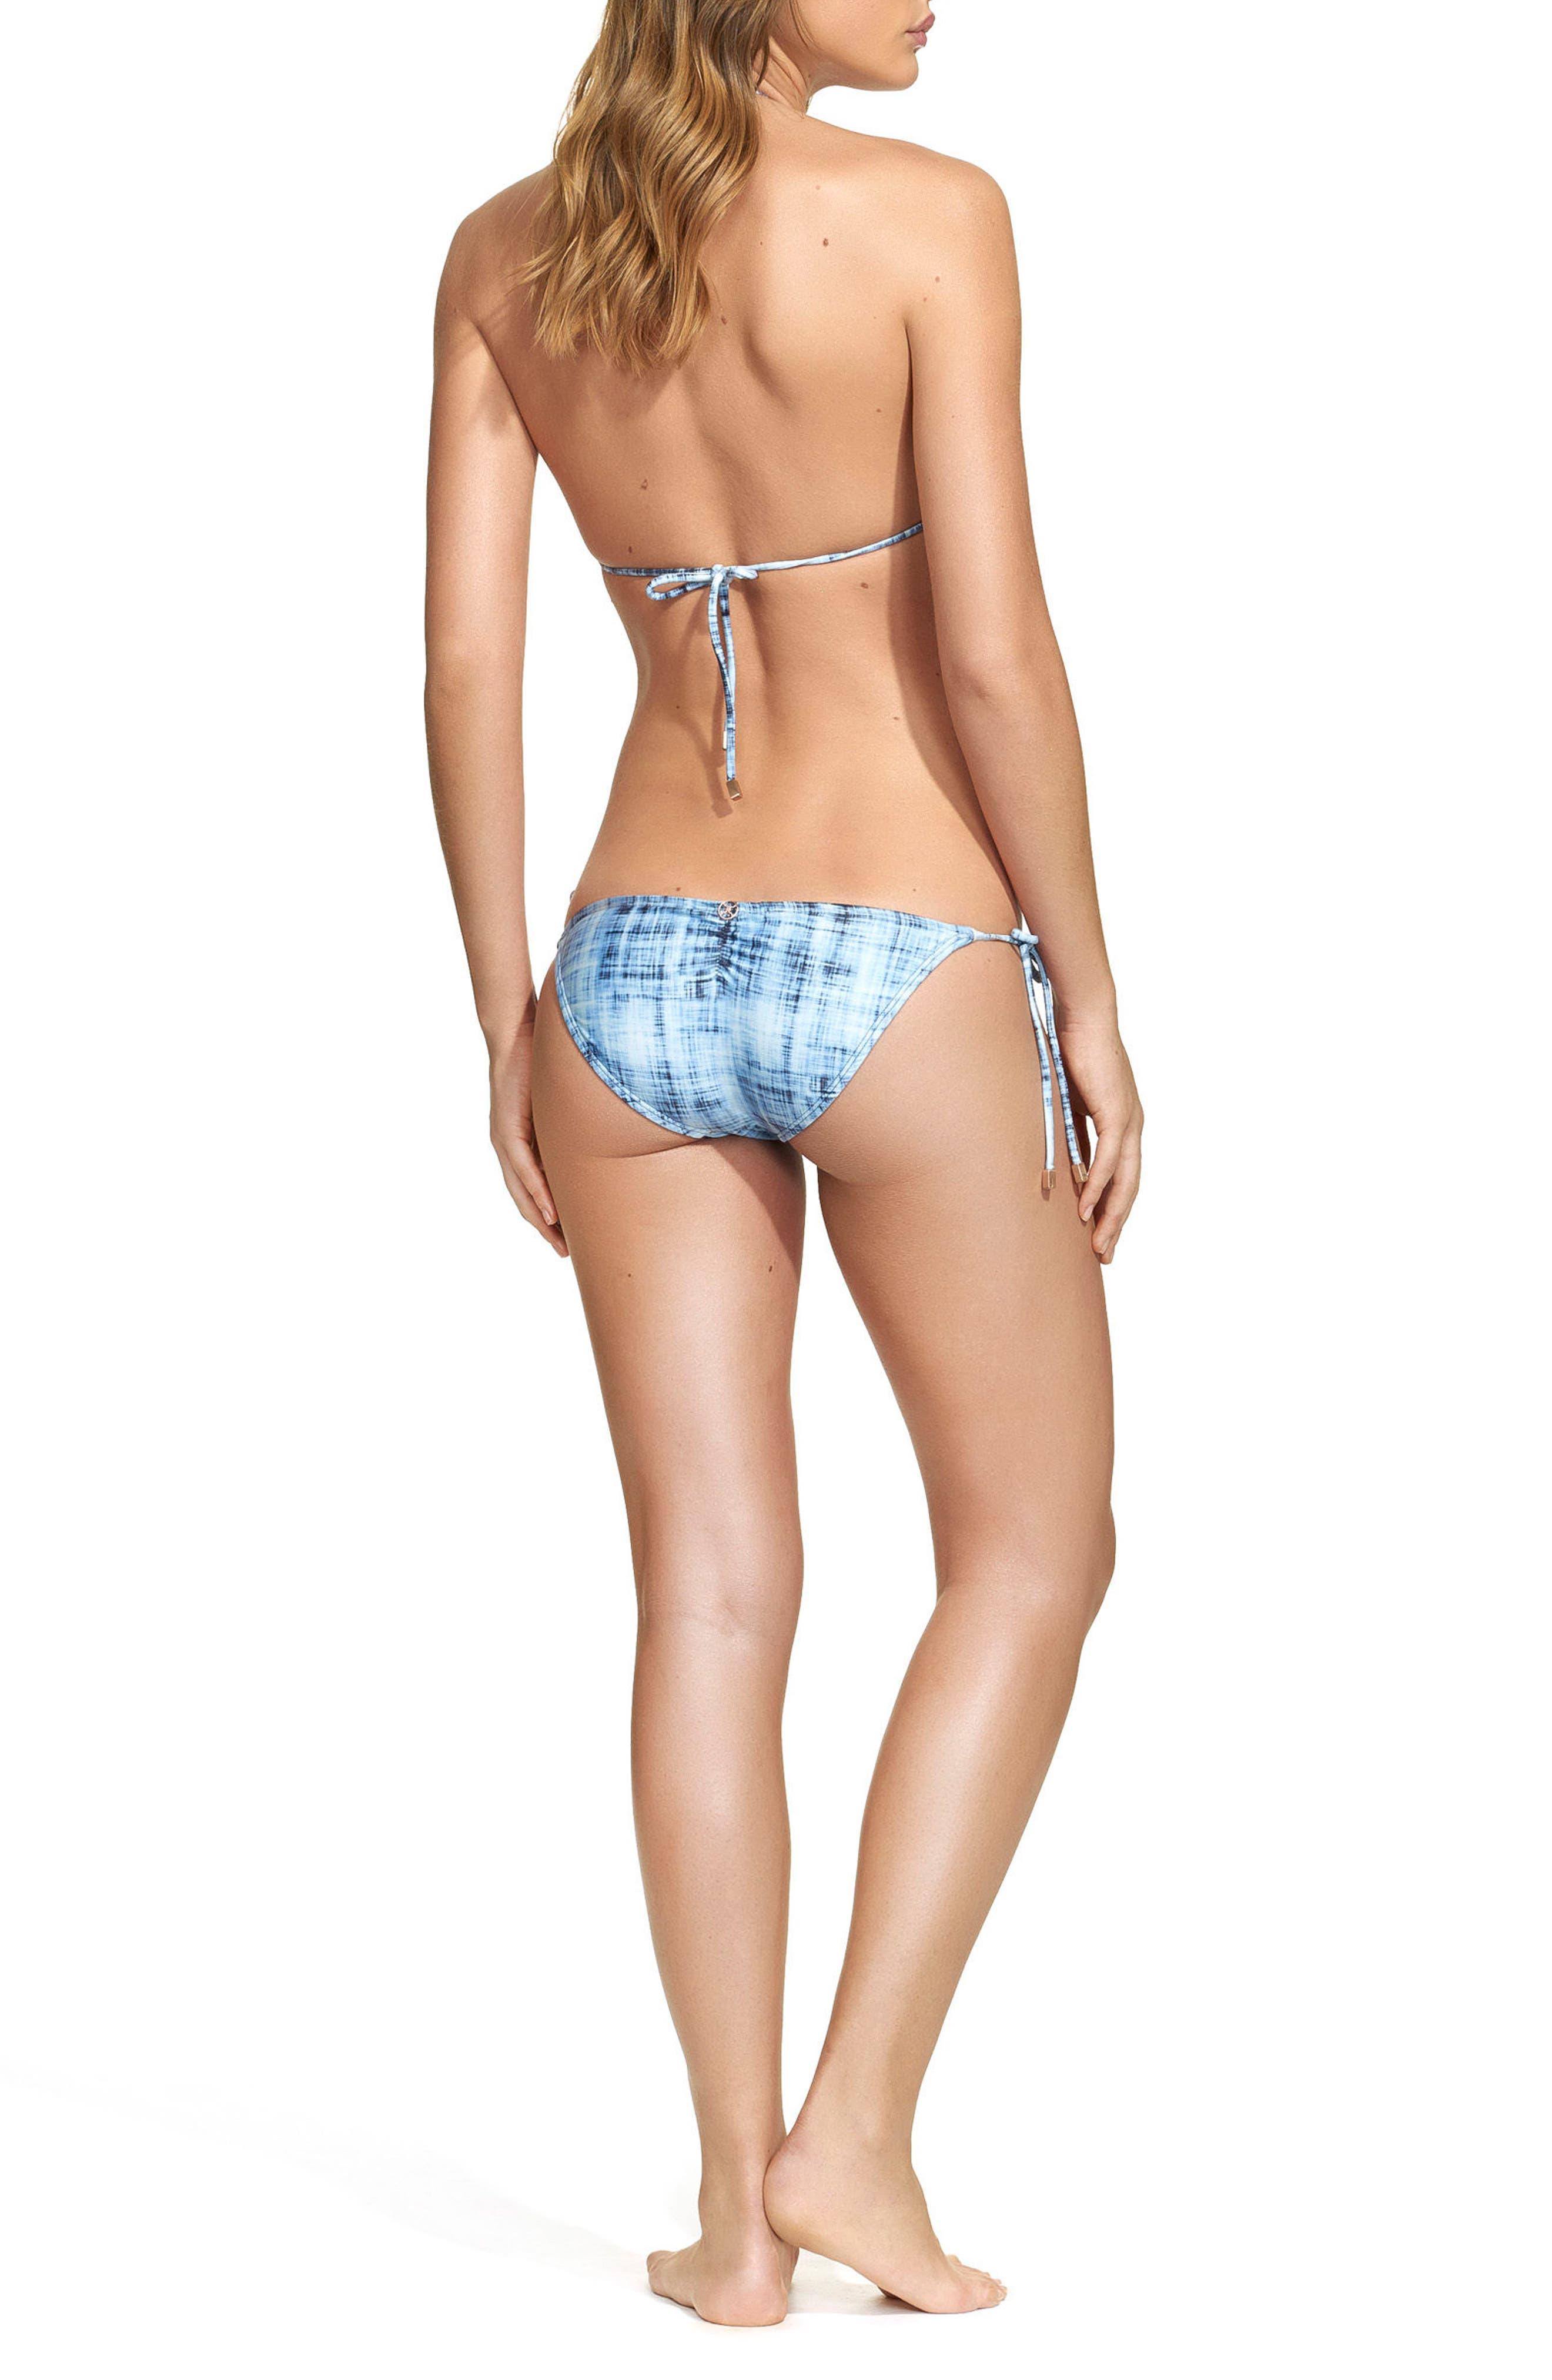 Rustic Ripple Side Tie Bikini Bottoms,                             Alternate thumbnail 4, color,                             400